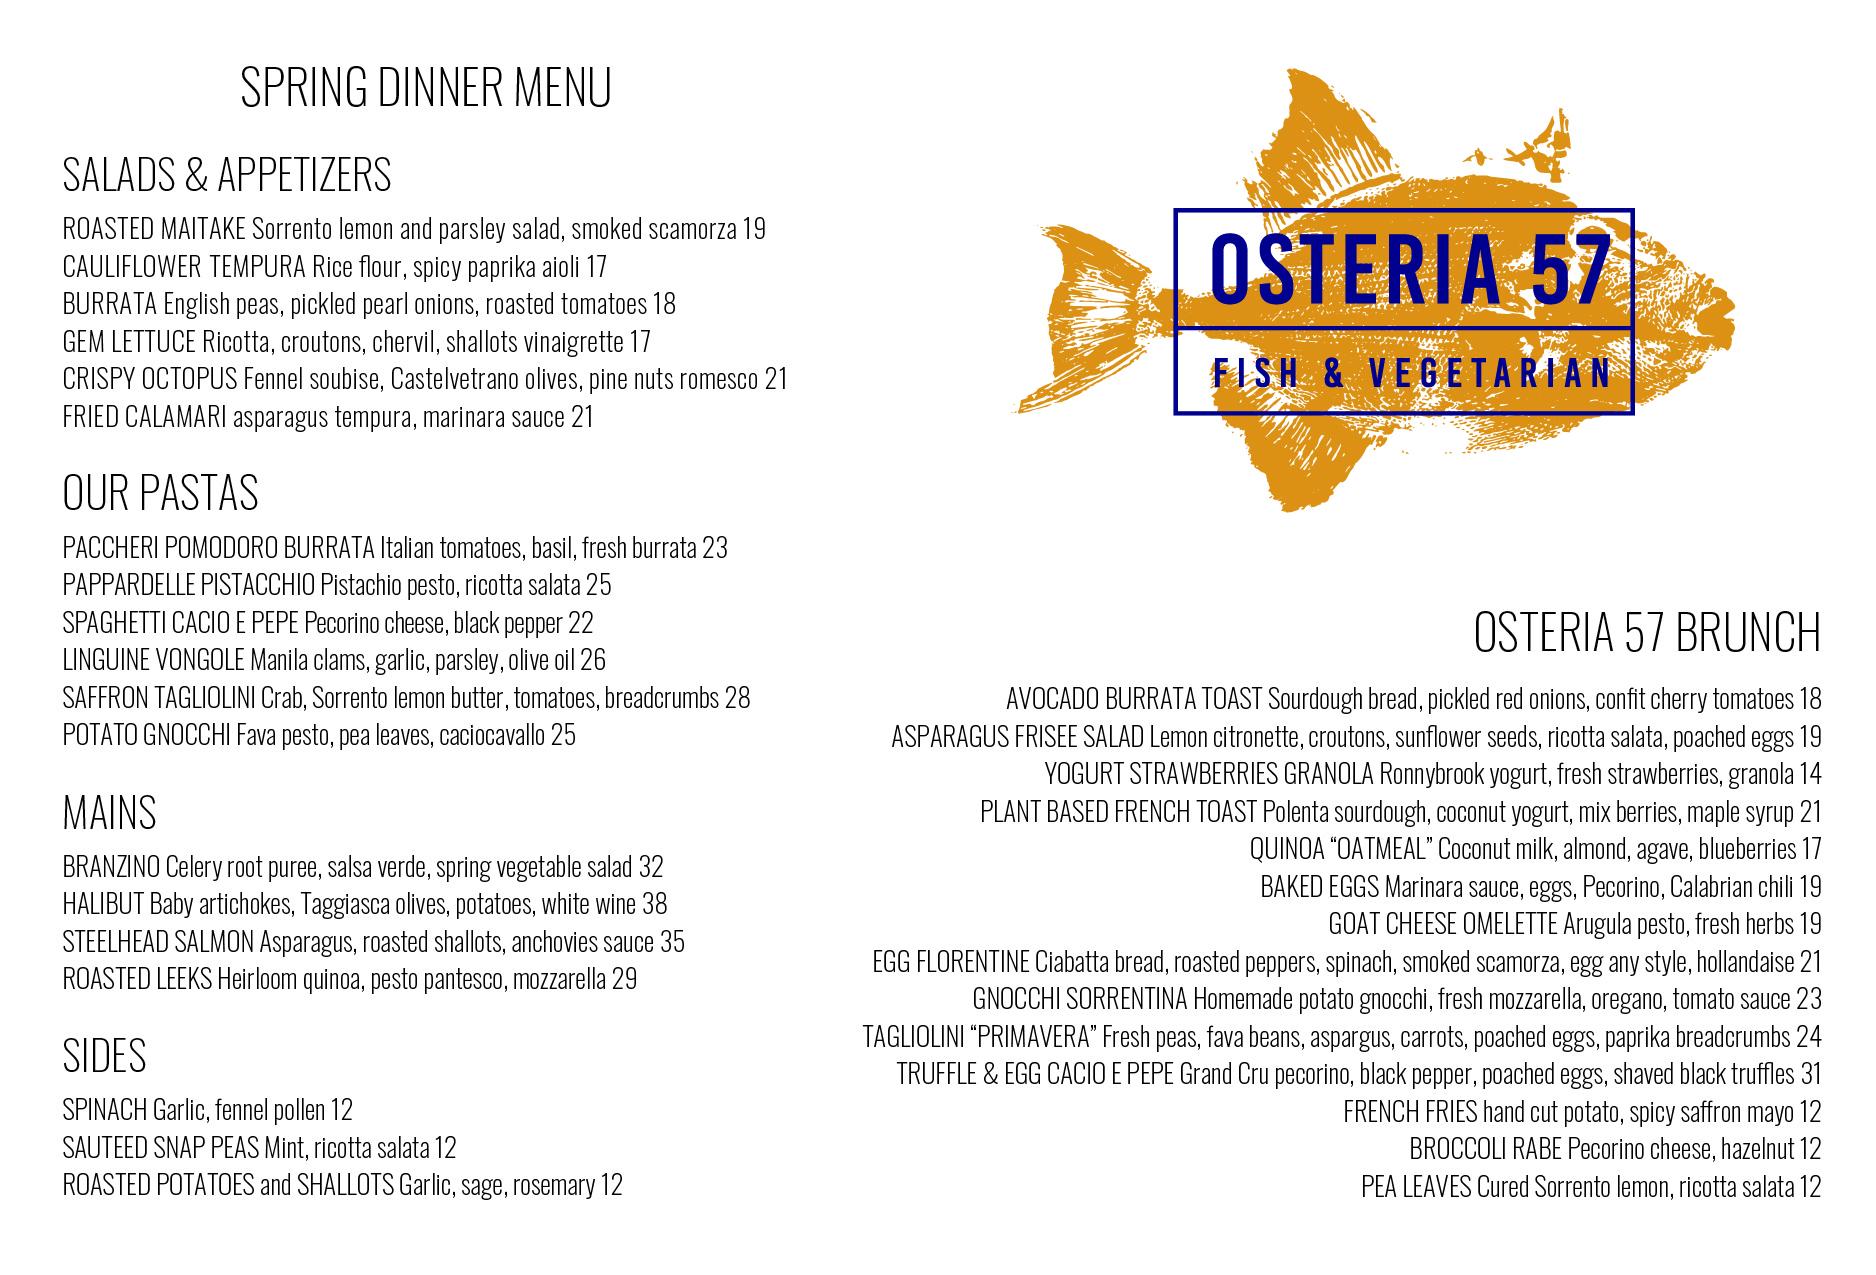 Osteria 57 food menu